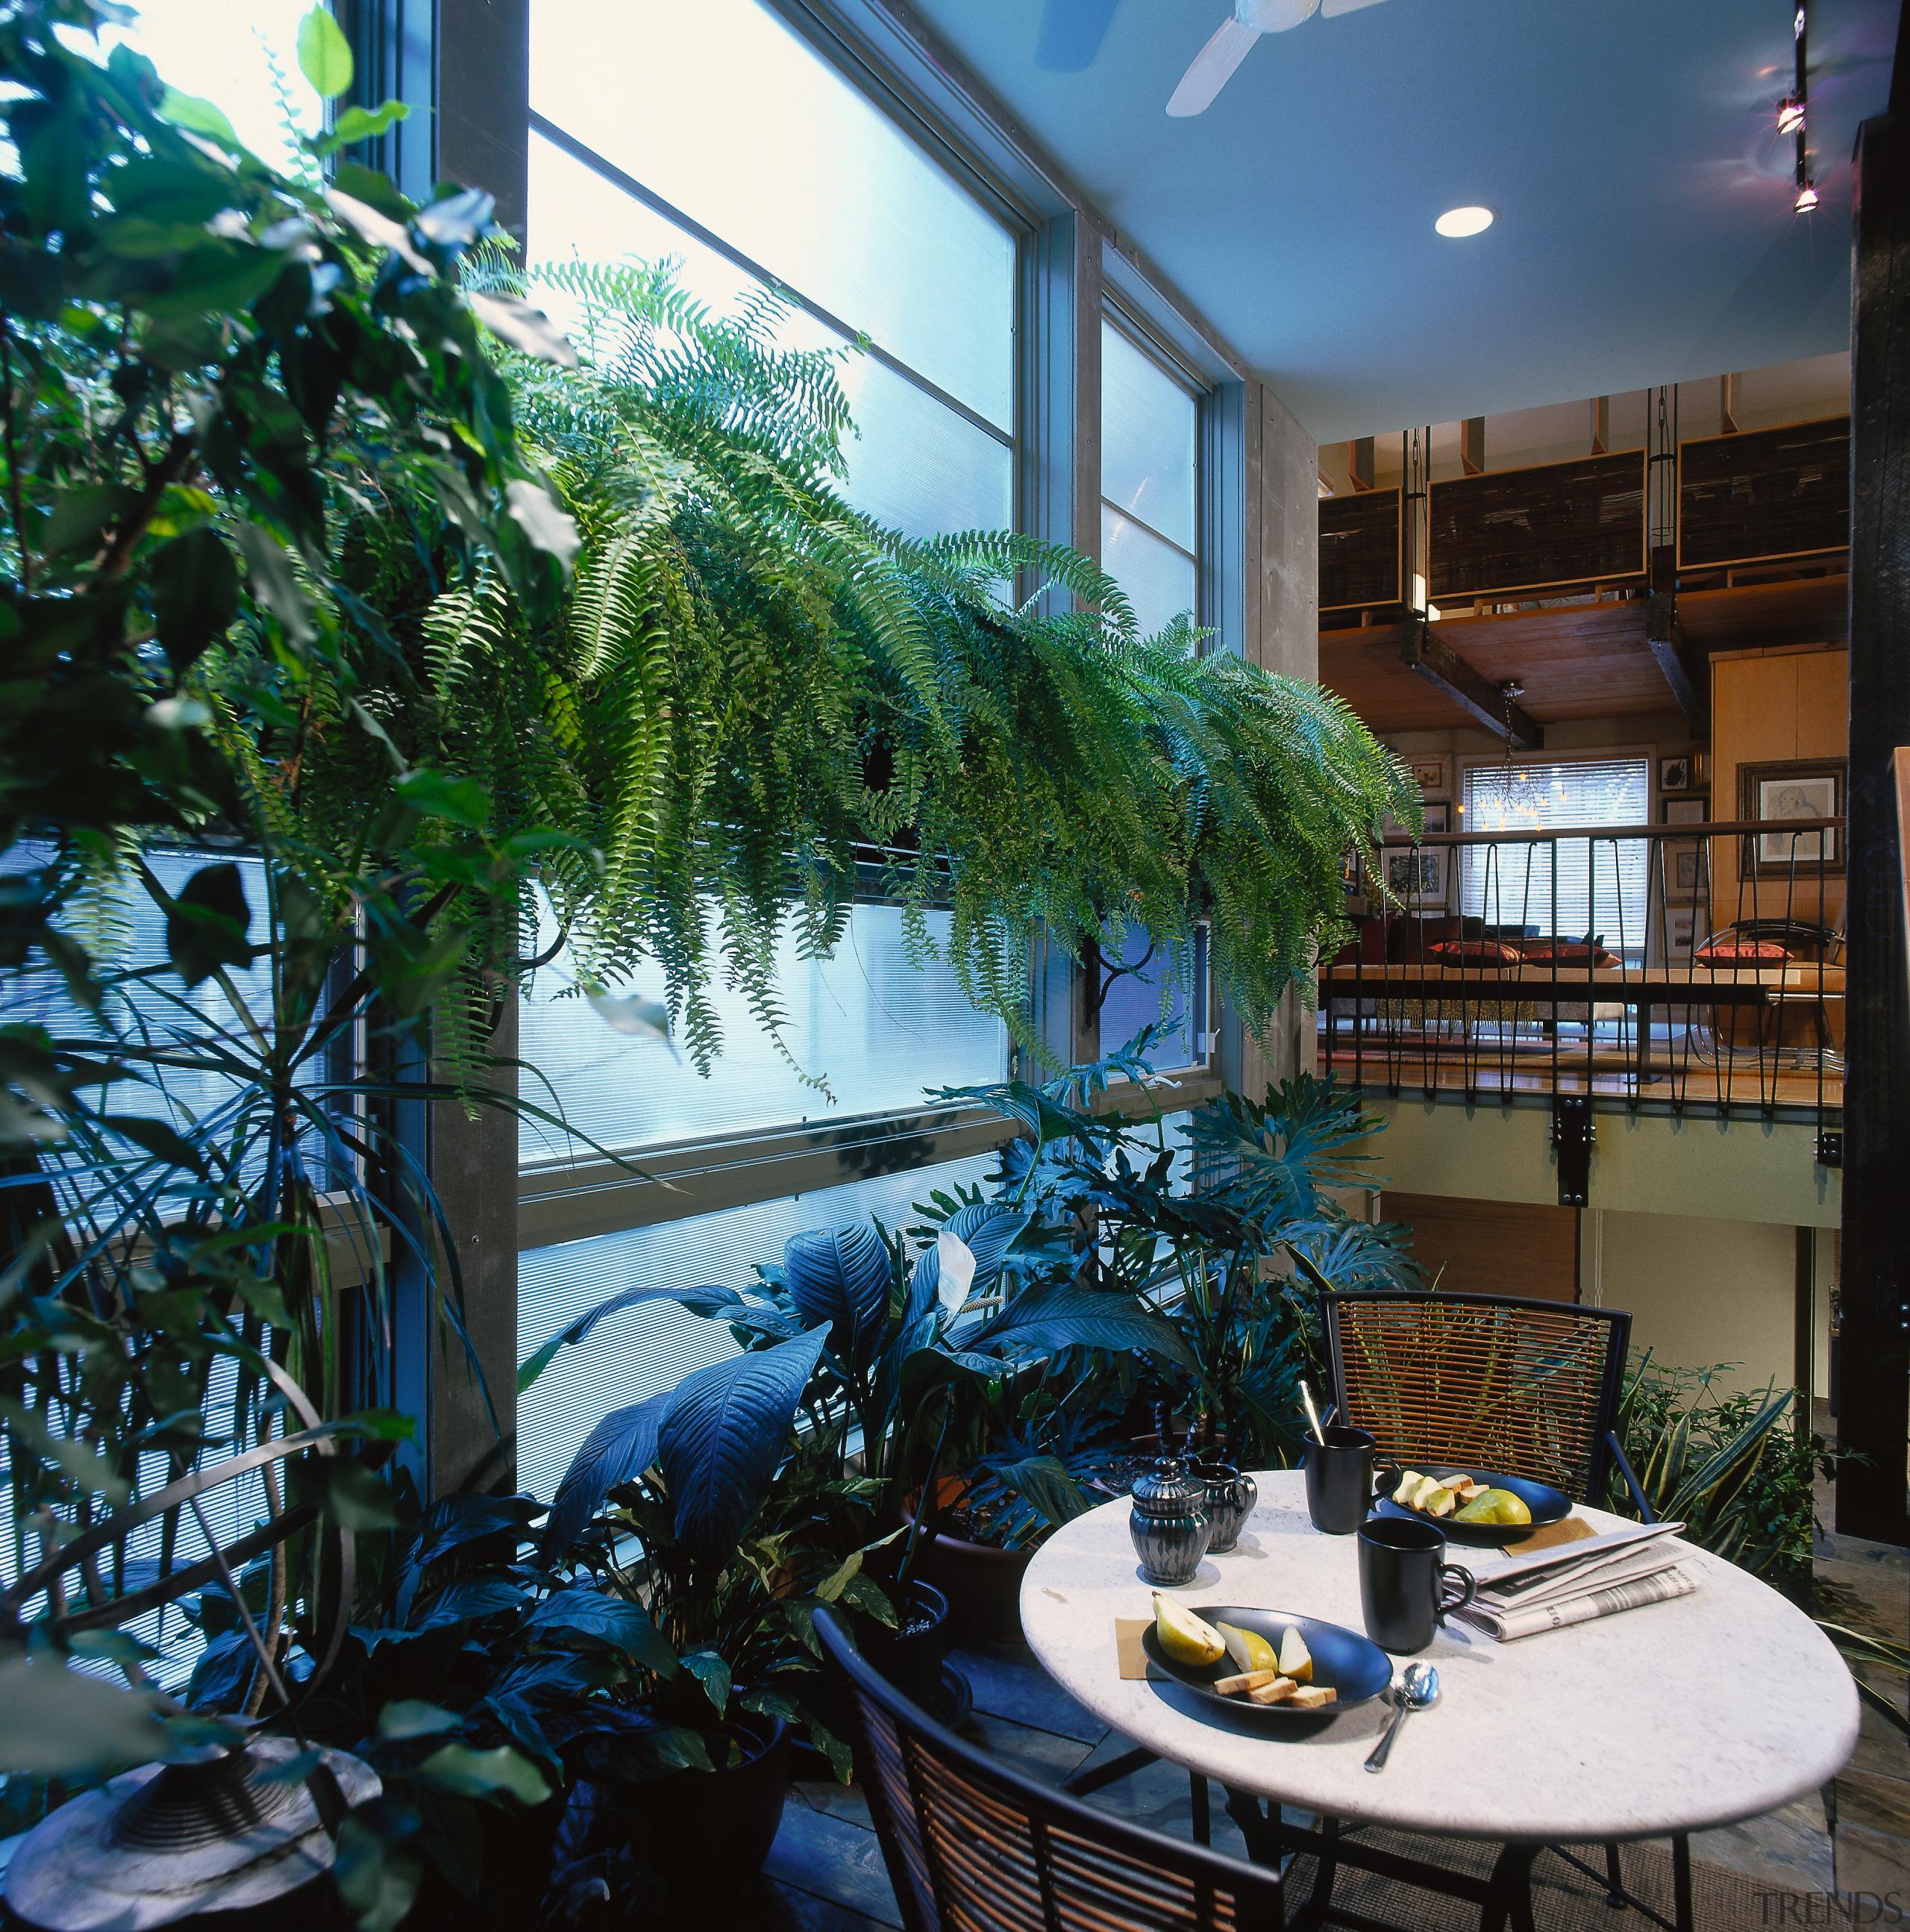 View of the indoor garden room, many palnts, home, interior design, plant, tree, window, black